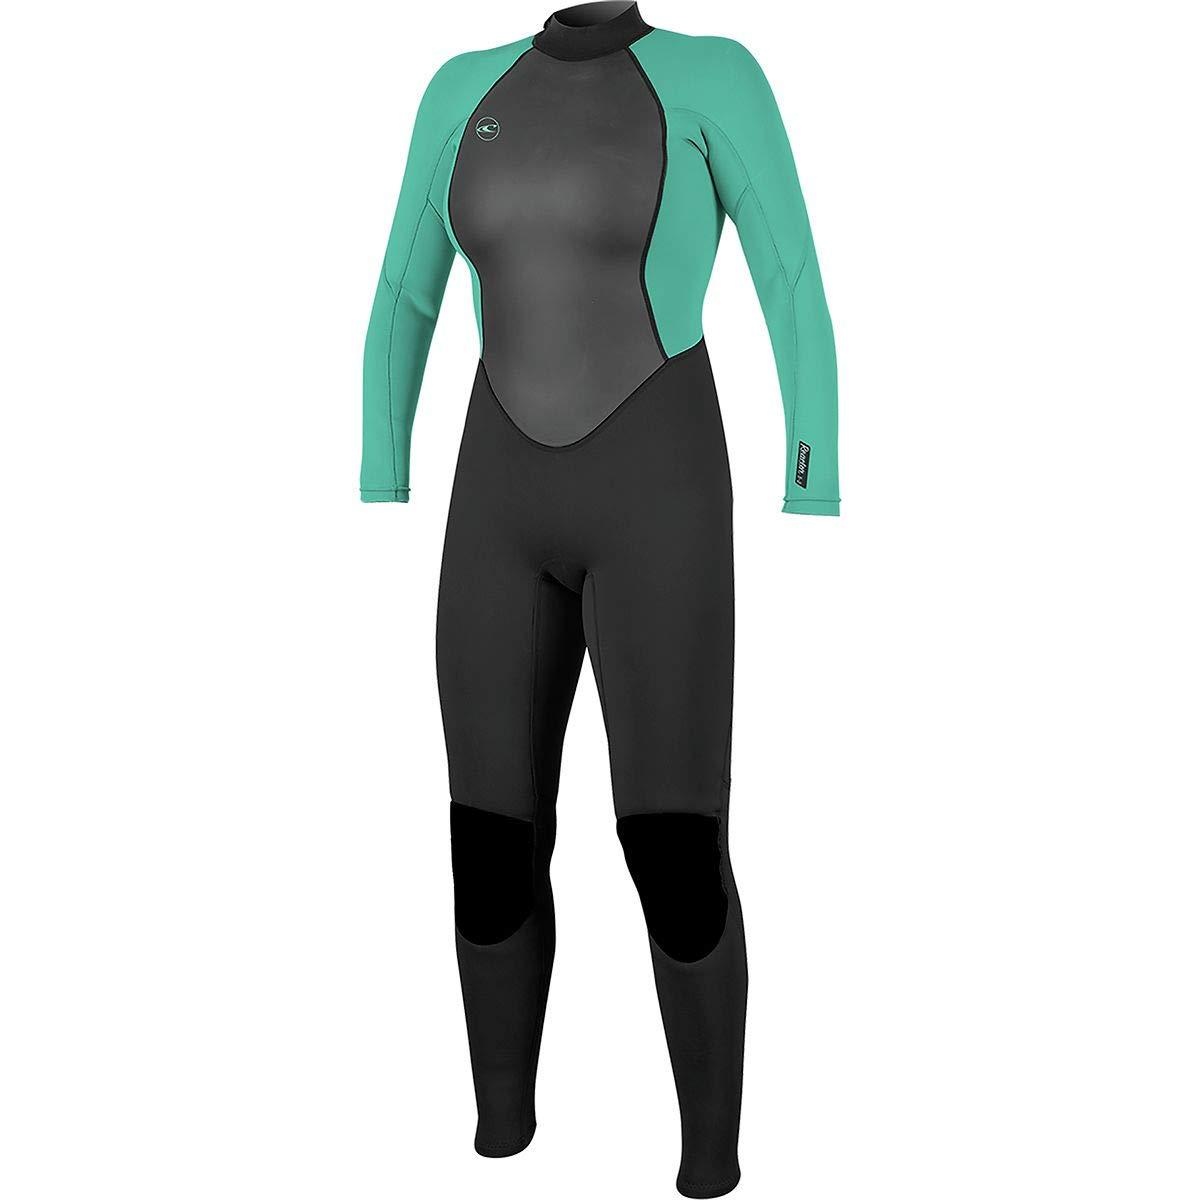 O'Neill Women's Reactor-2 3/2mm Back Zip Full Wetsuit, Black/Aqua, 6